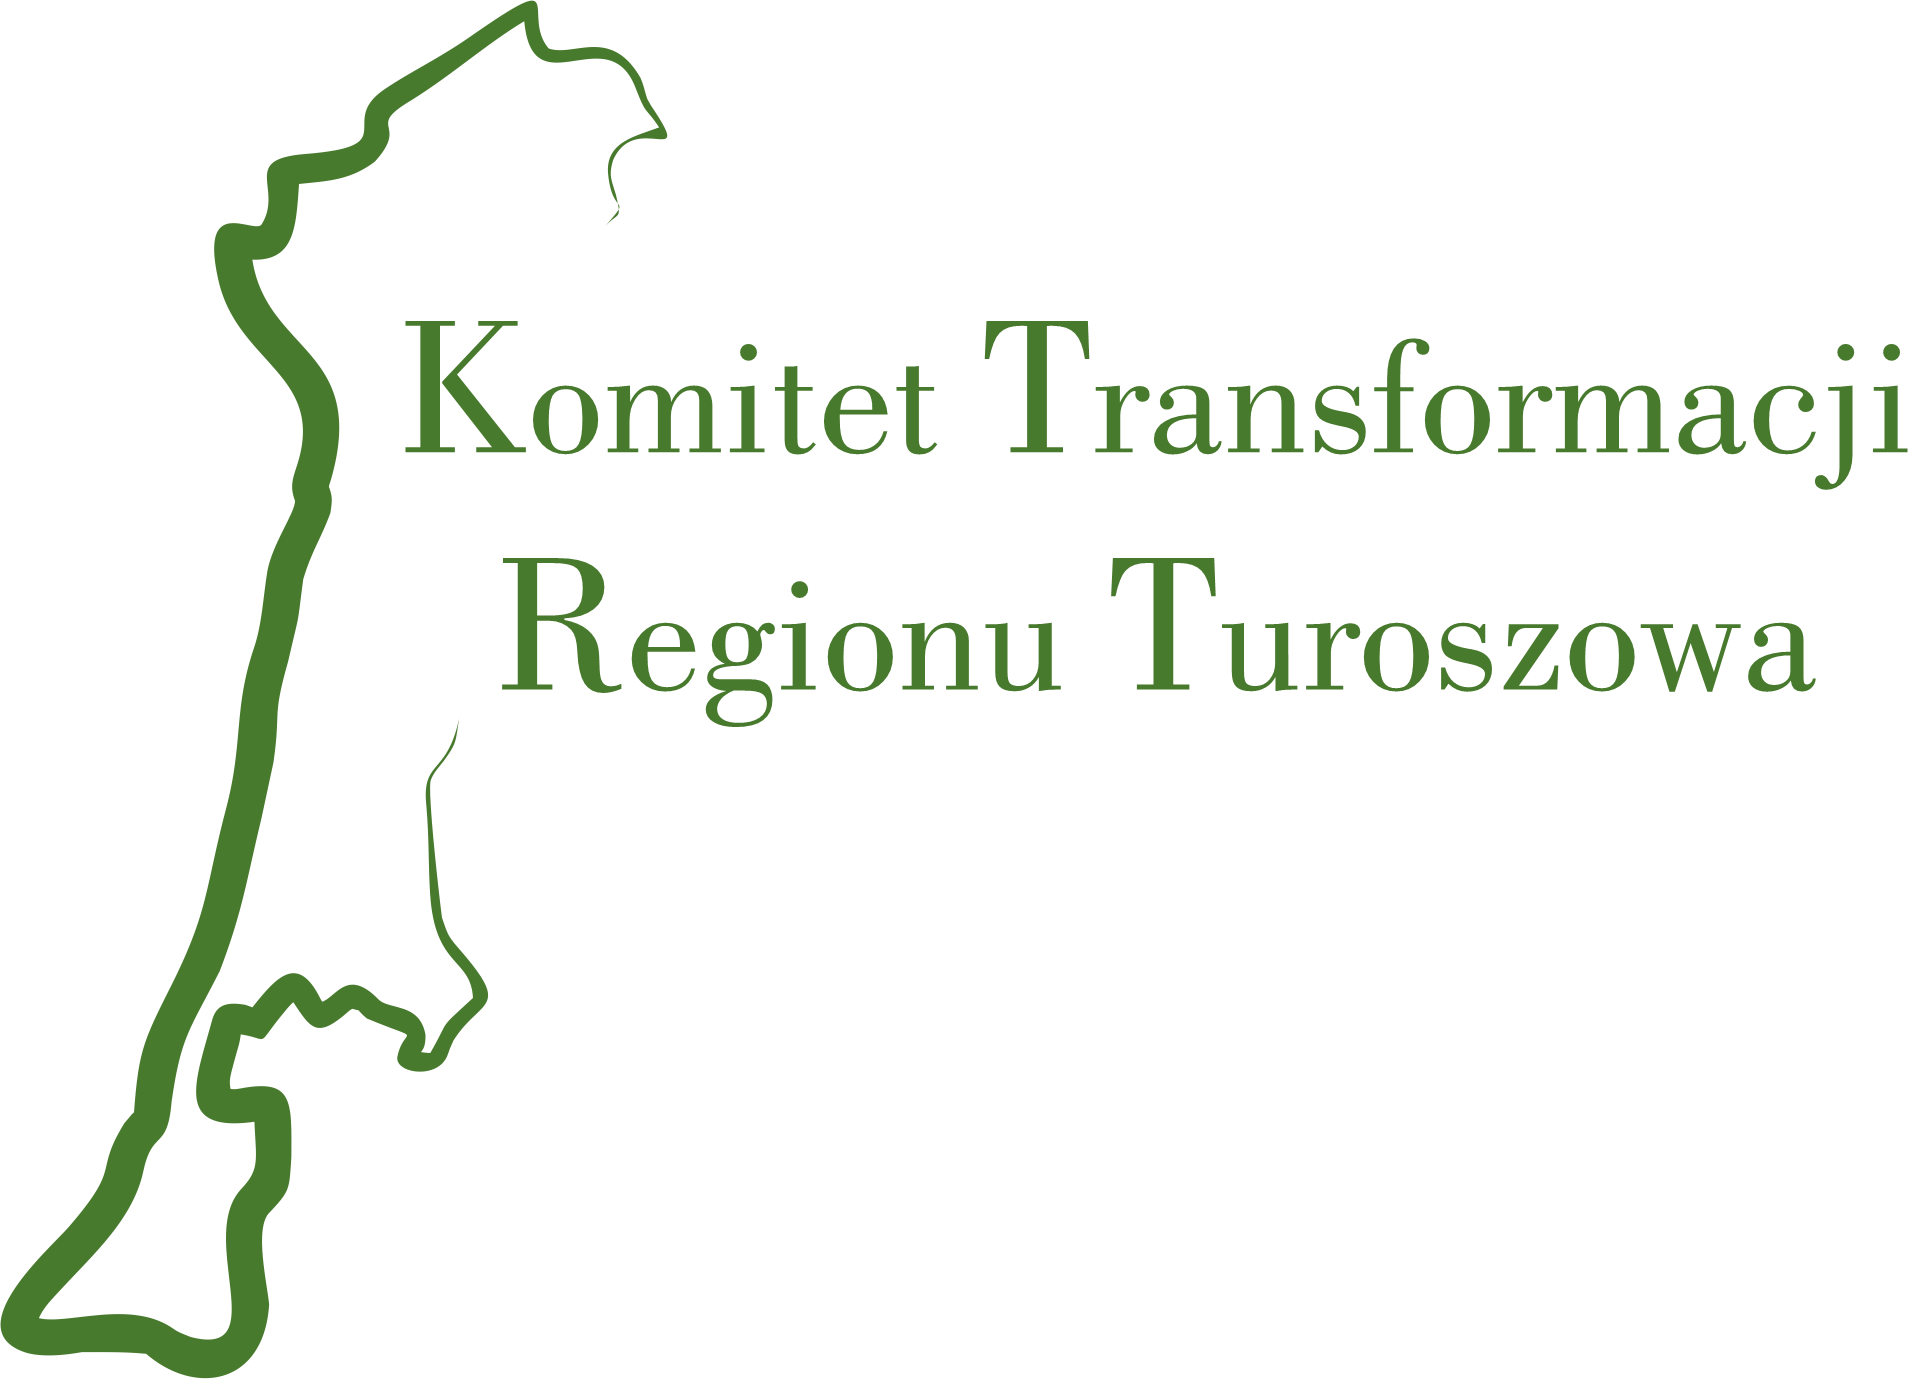 Region Turoszowa